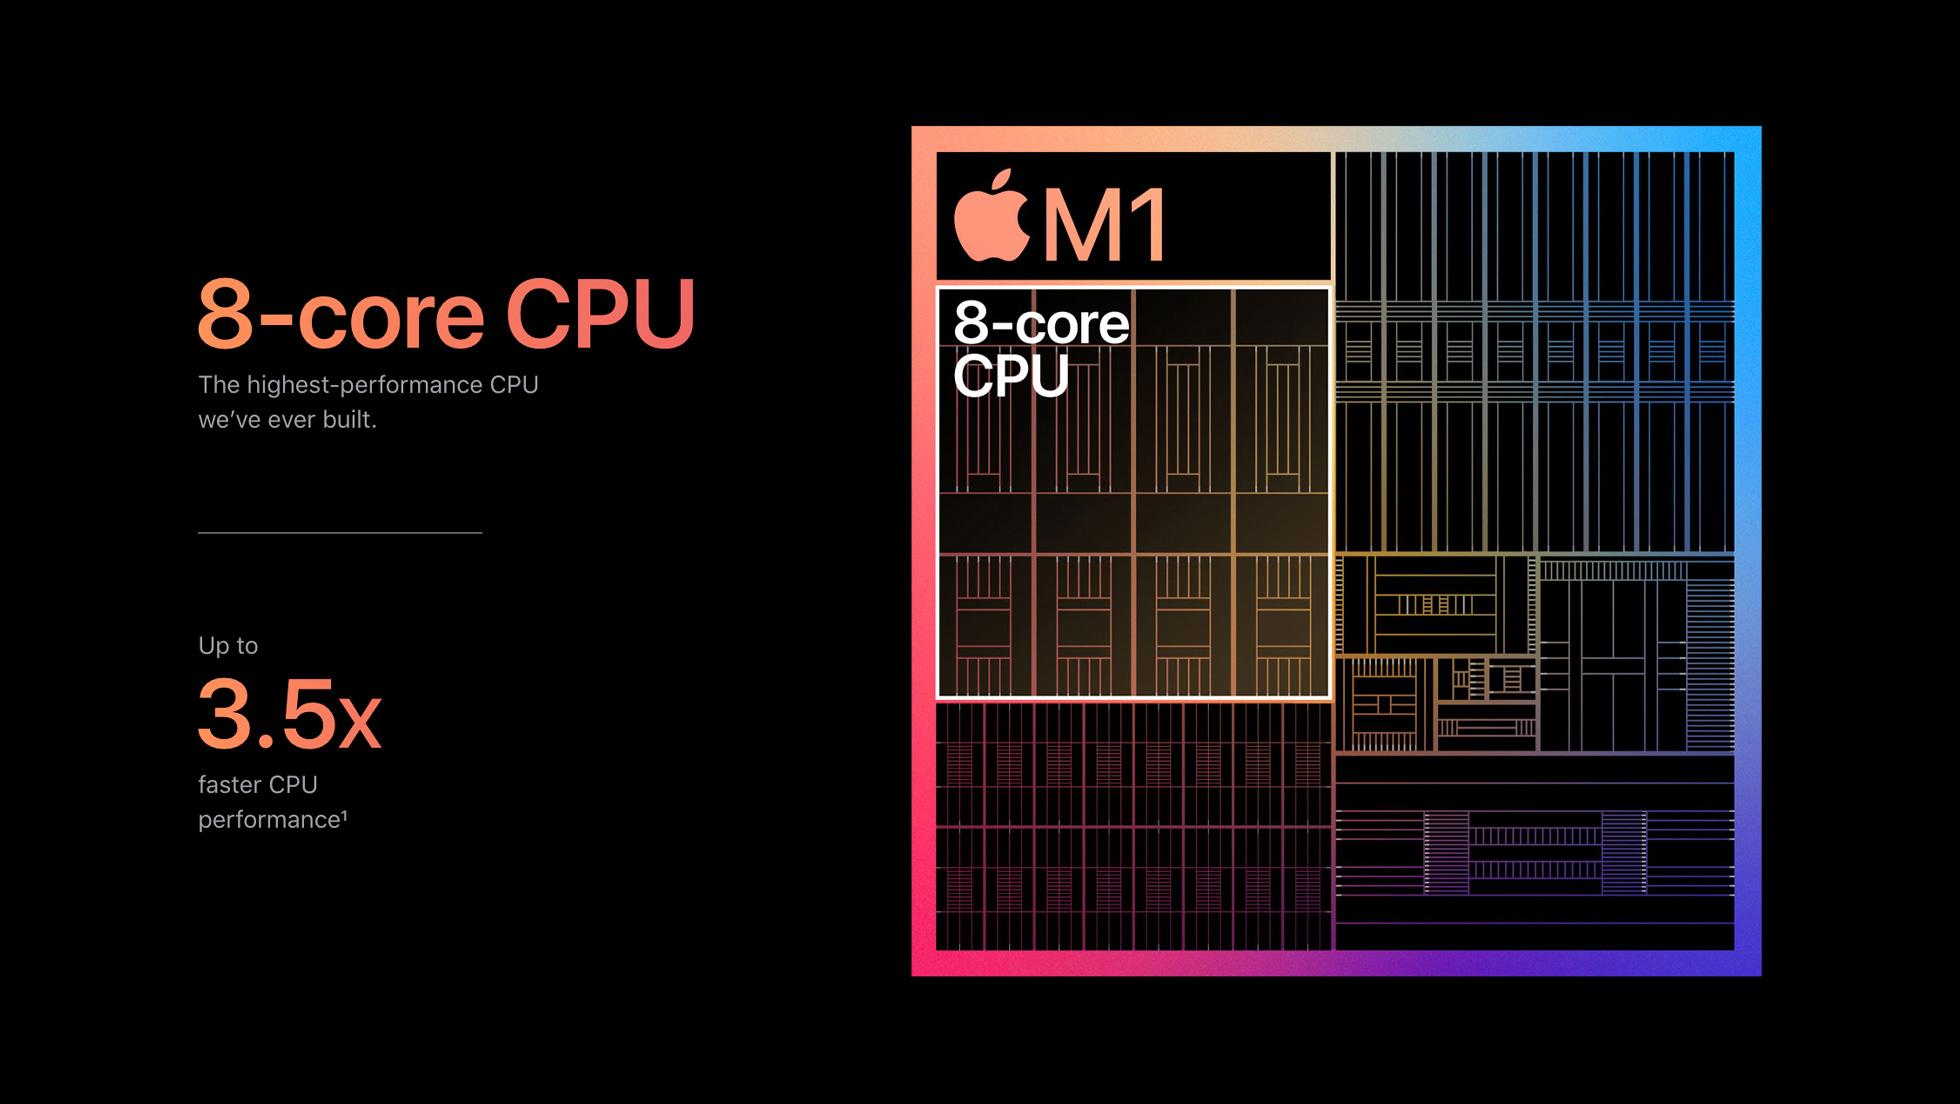 Apple_m1-chip-8-core-cpu-chart_11102020.jpg